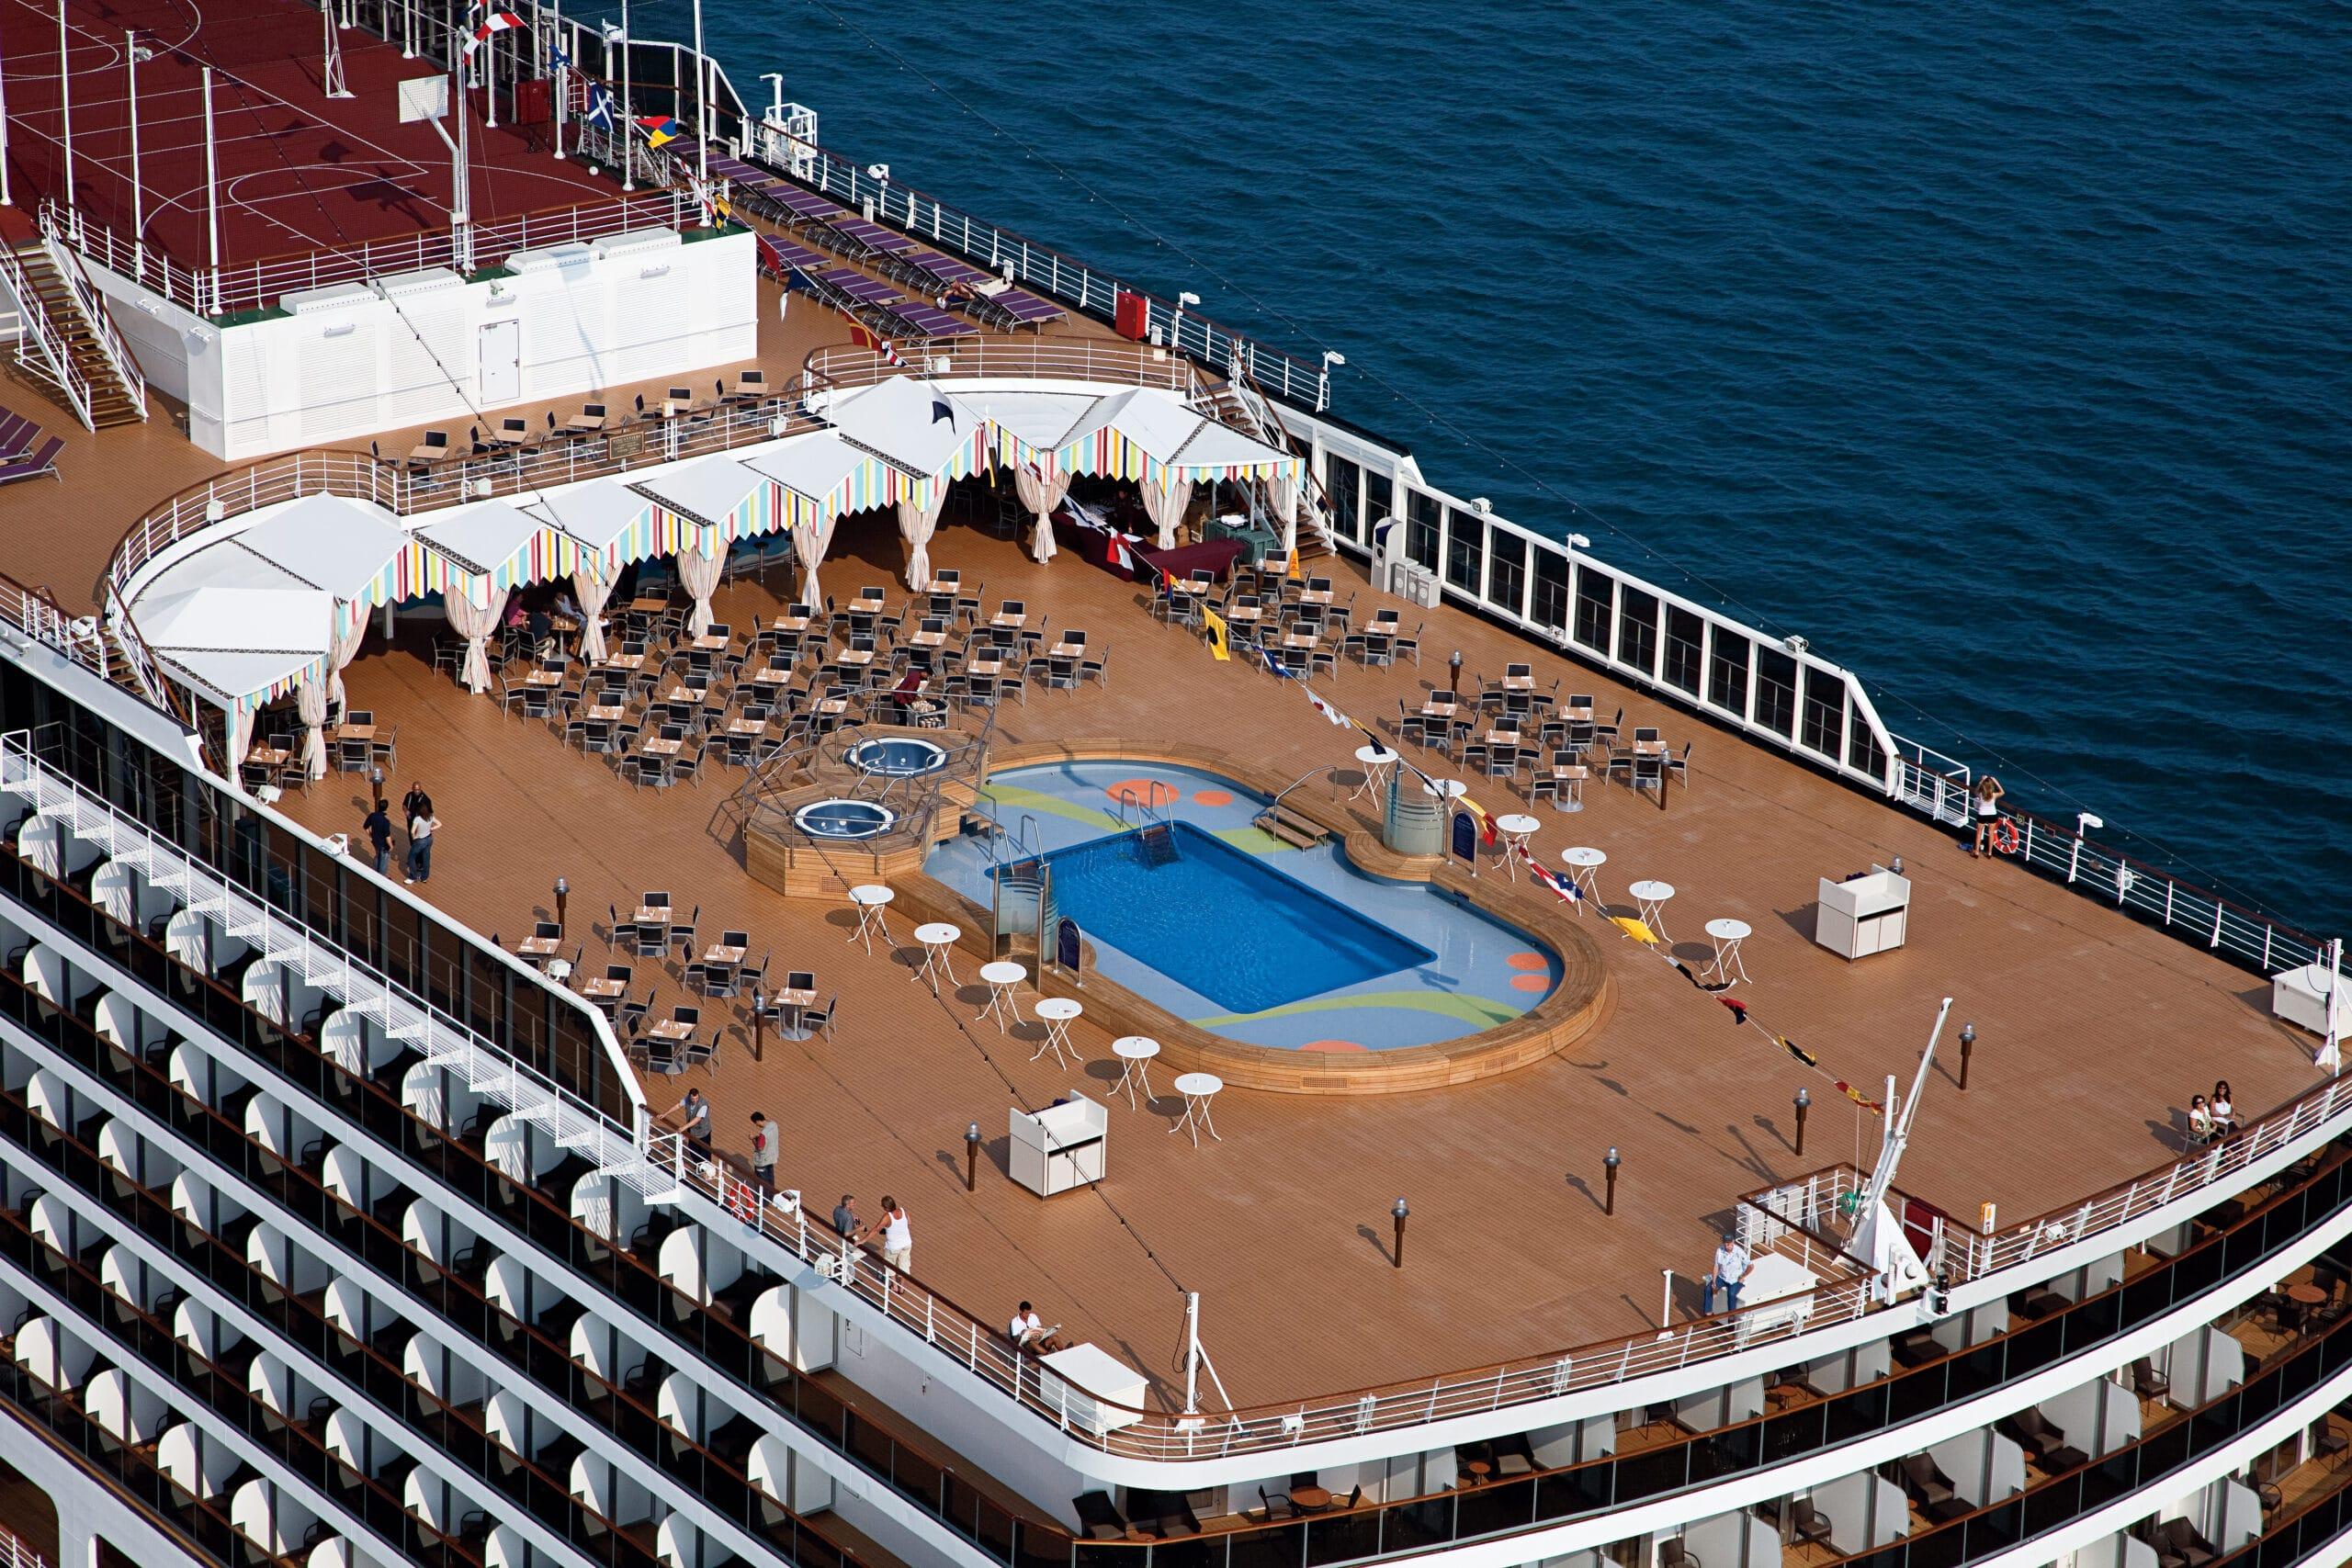 cruiseschip - Holland America Line - nieuw- Amsterdam - Pool Achterdeck